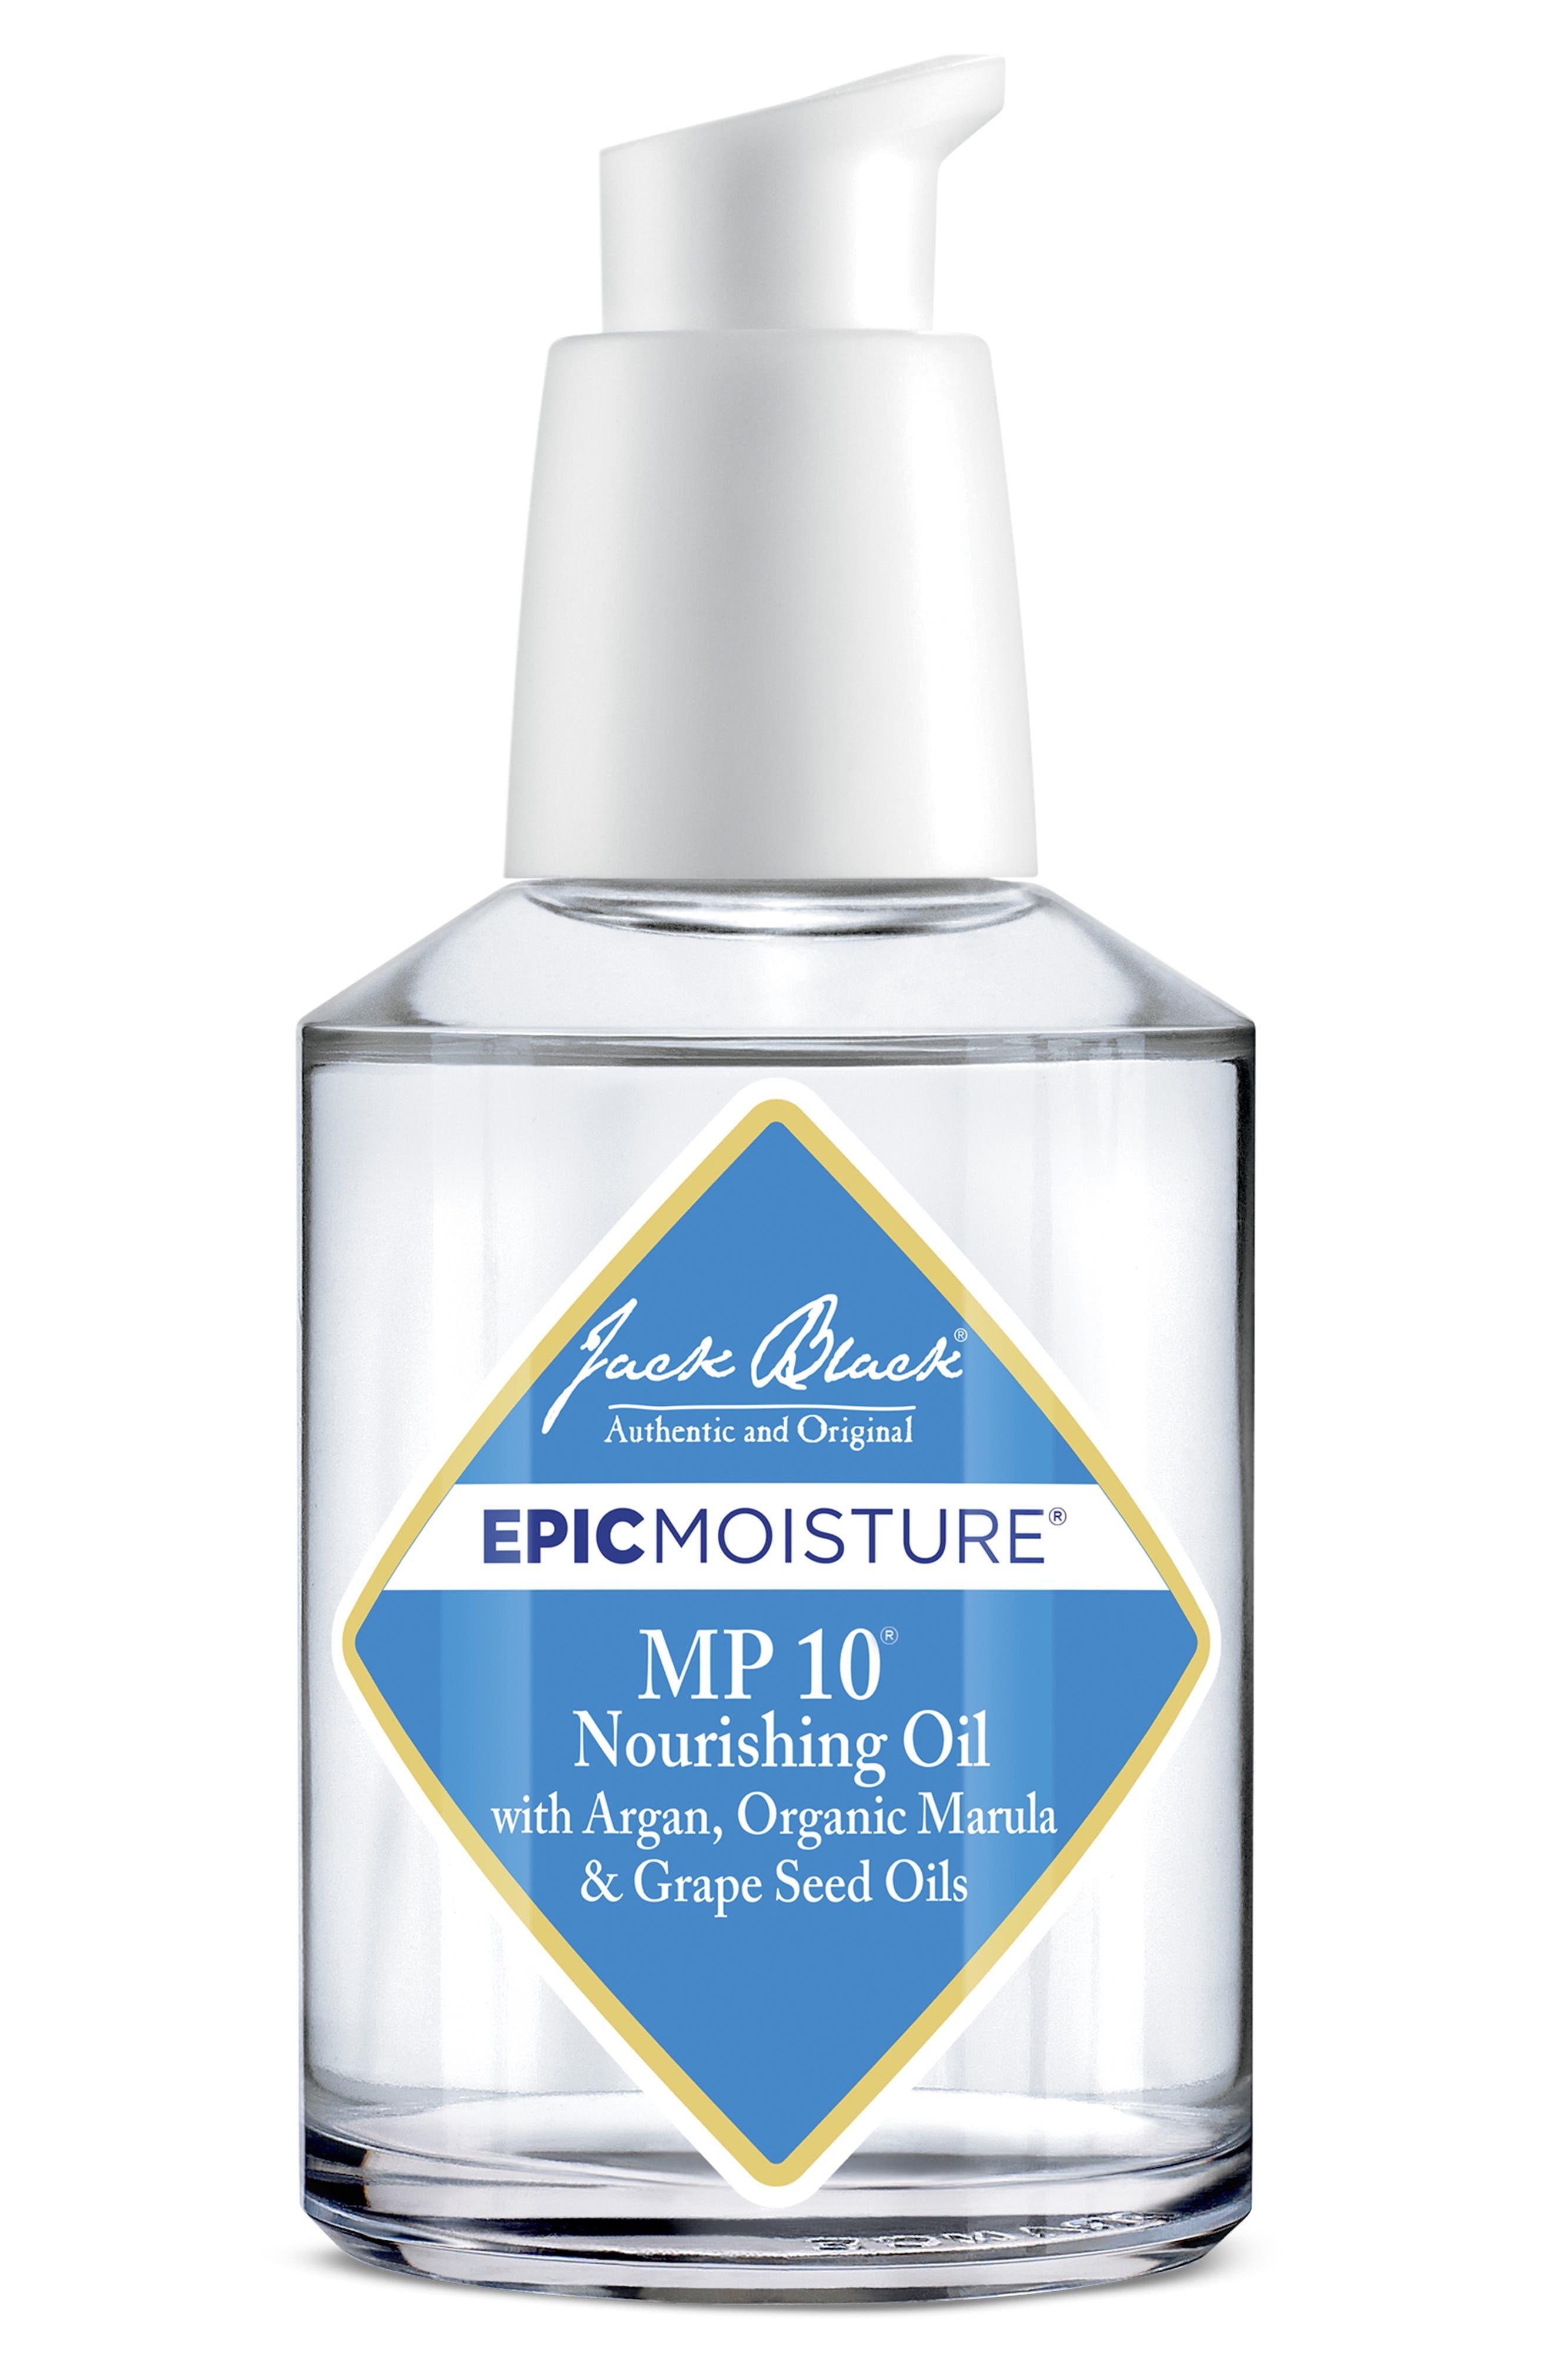 Epic Moisture(TM) Mp 10(TM) Nourishing Oil